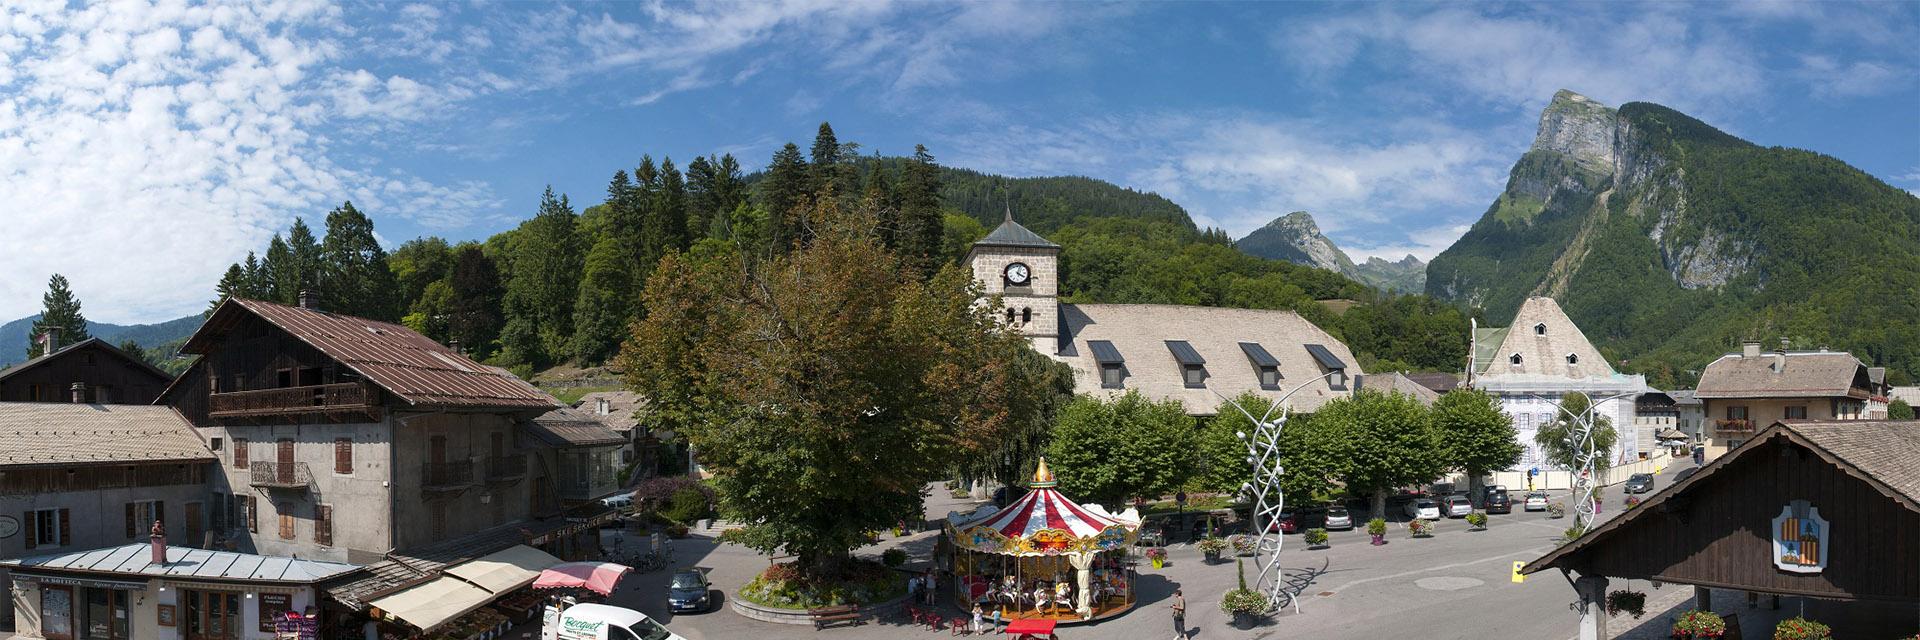 Village_club_vacances_haute-savoie_Berouze-famille-nature-foret-samoens-ete